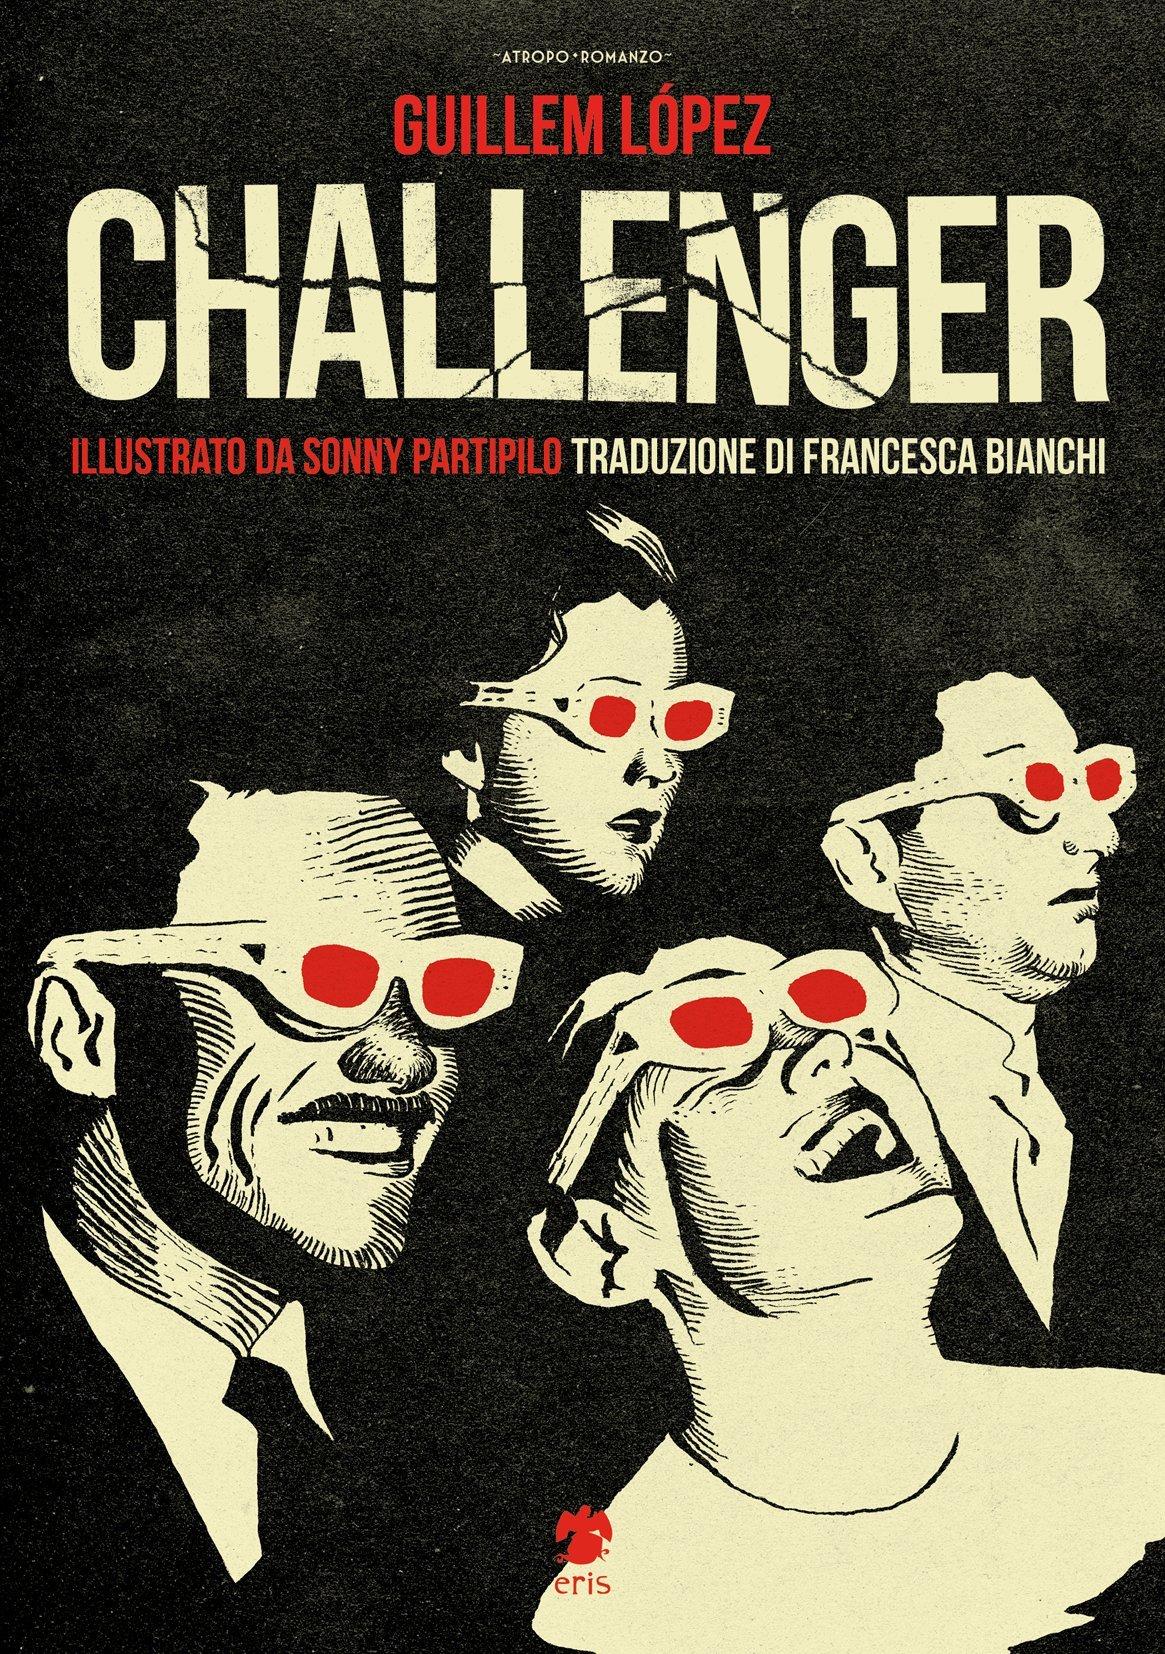 Guillem Lopez, Challenger, Erisi Edizioni, una banda di cefali, recensione